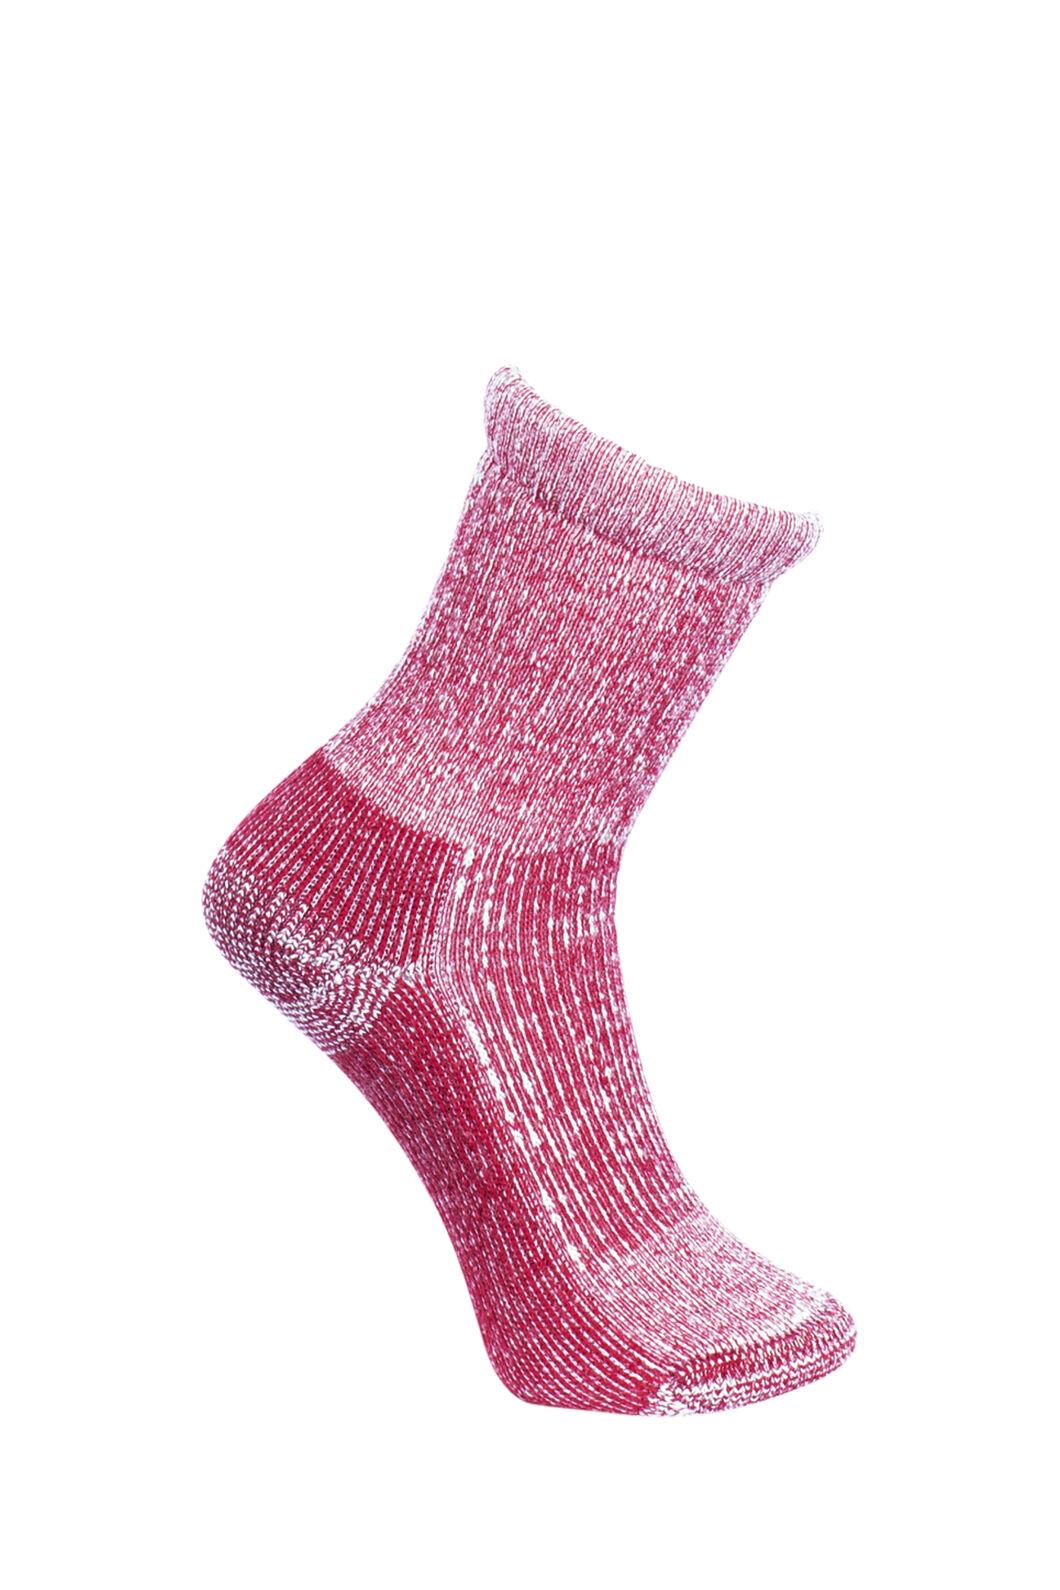 Macpac Winter Hiker Socks — Kids', Red, hi-res